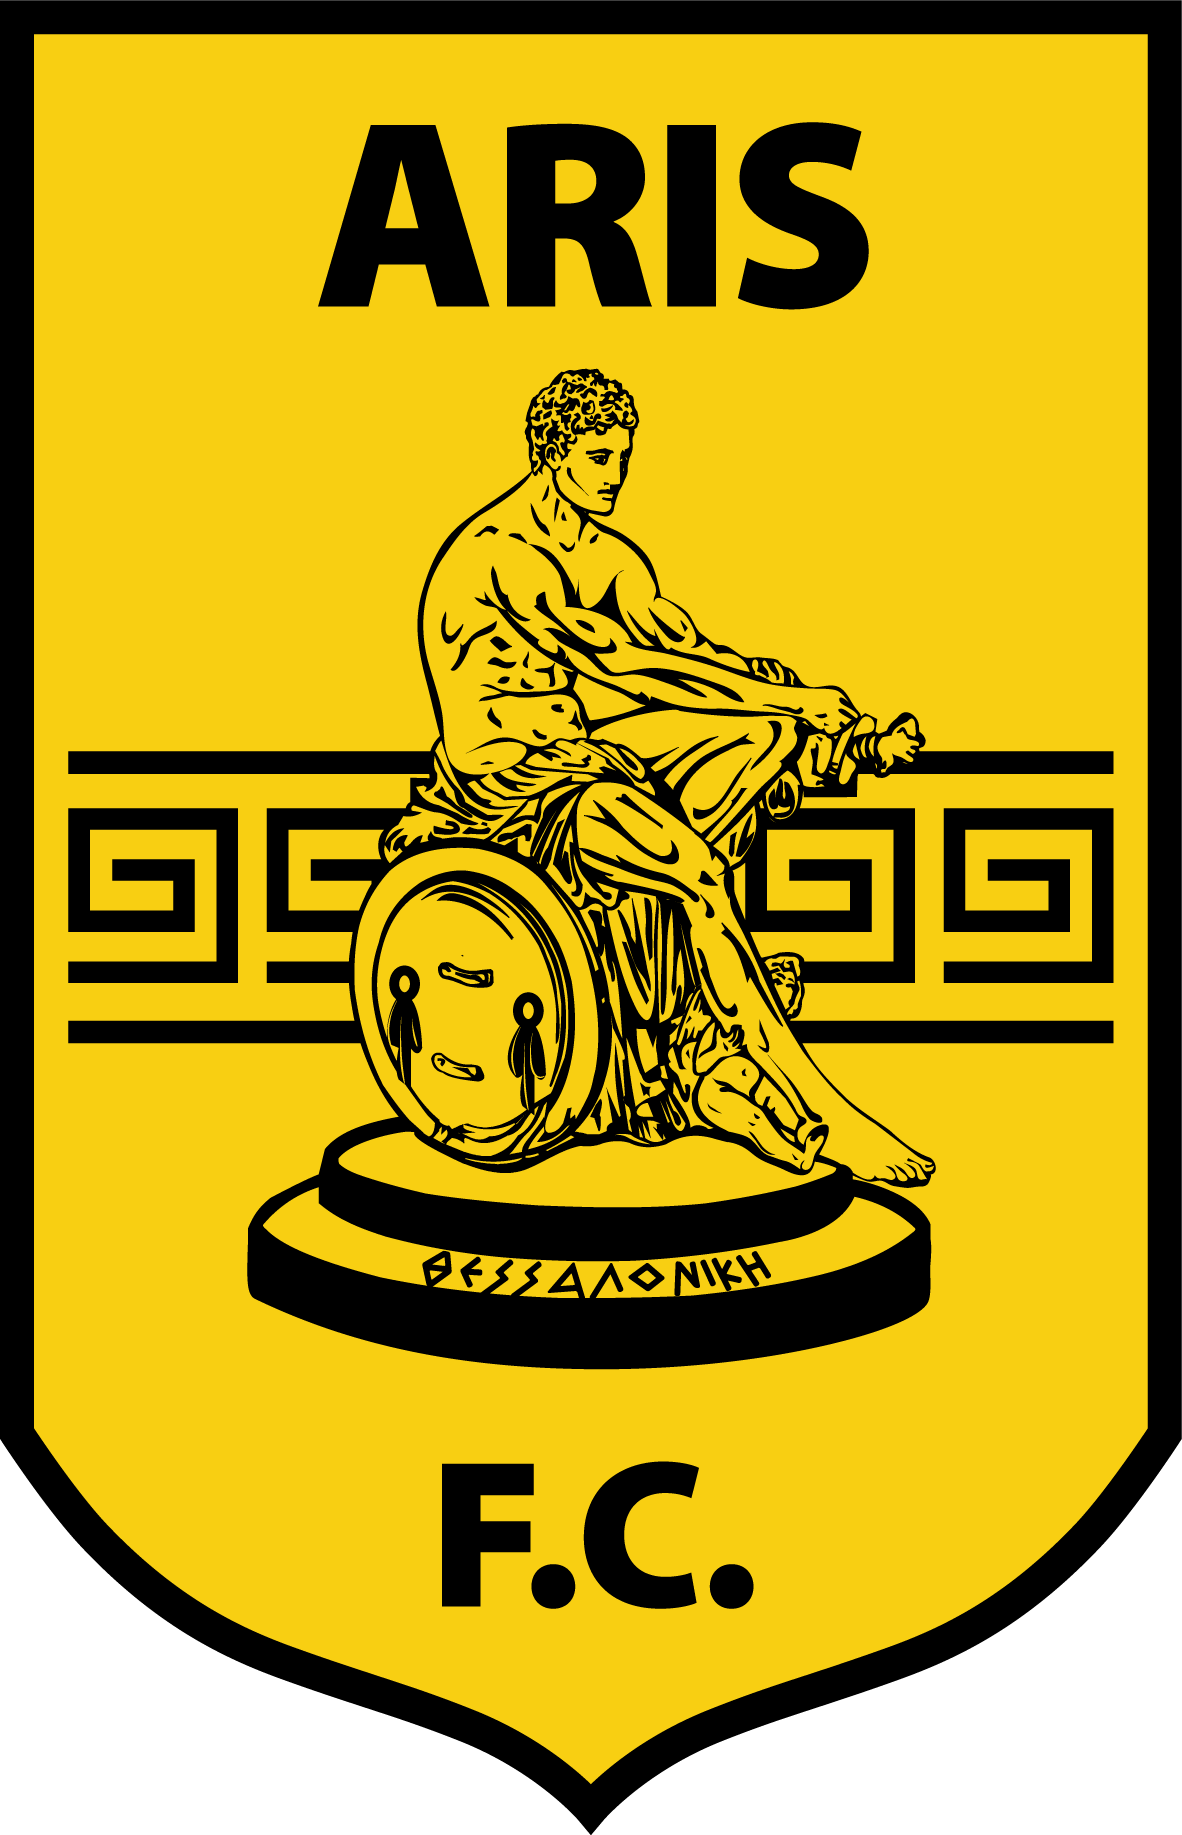 Aris FC ( Greeece ) Clubs Pinterest Logos and